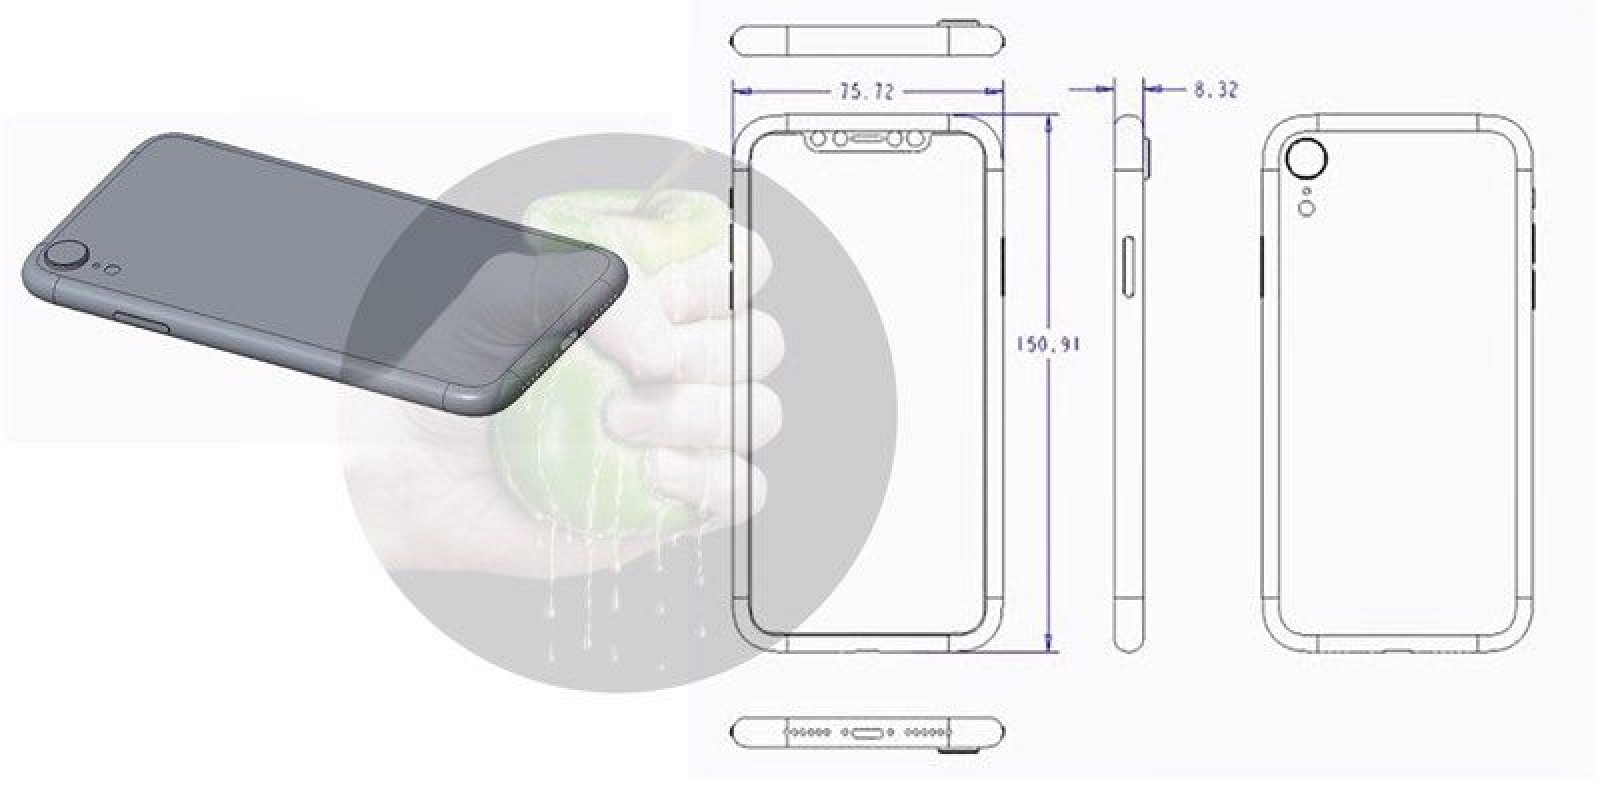 Schematics And Renderings Depict Apples 2018 Iphone Lineup Macrumors 3 Circuit Diagram